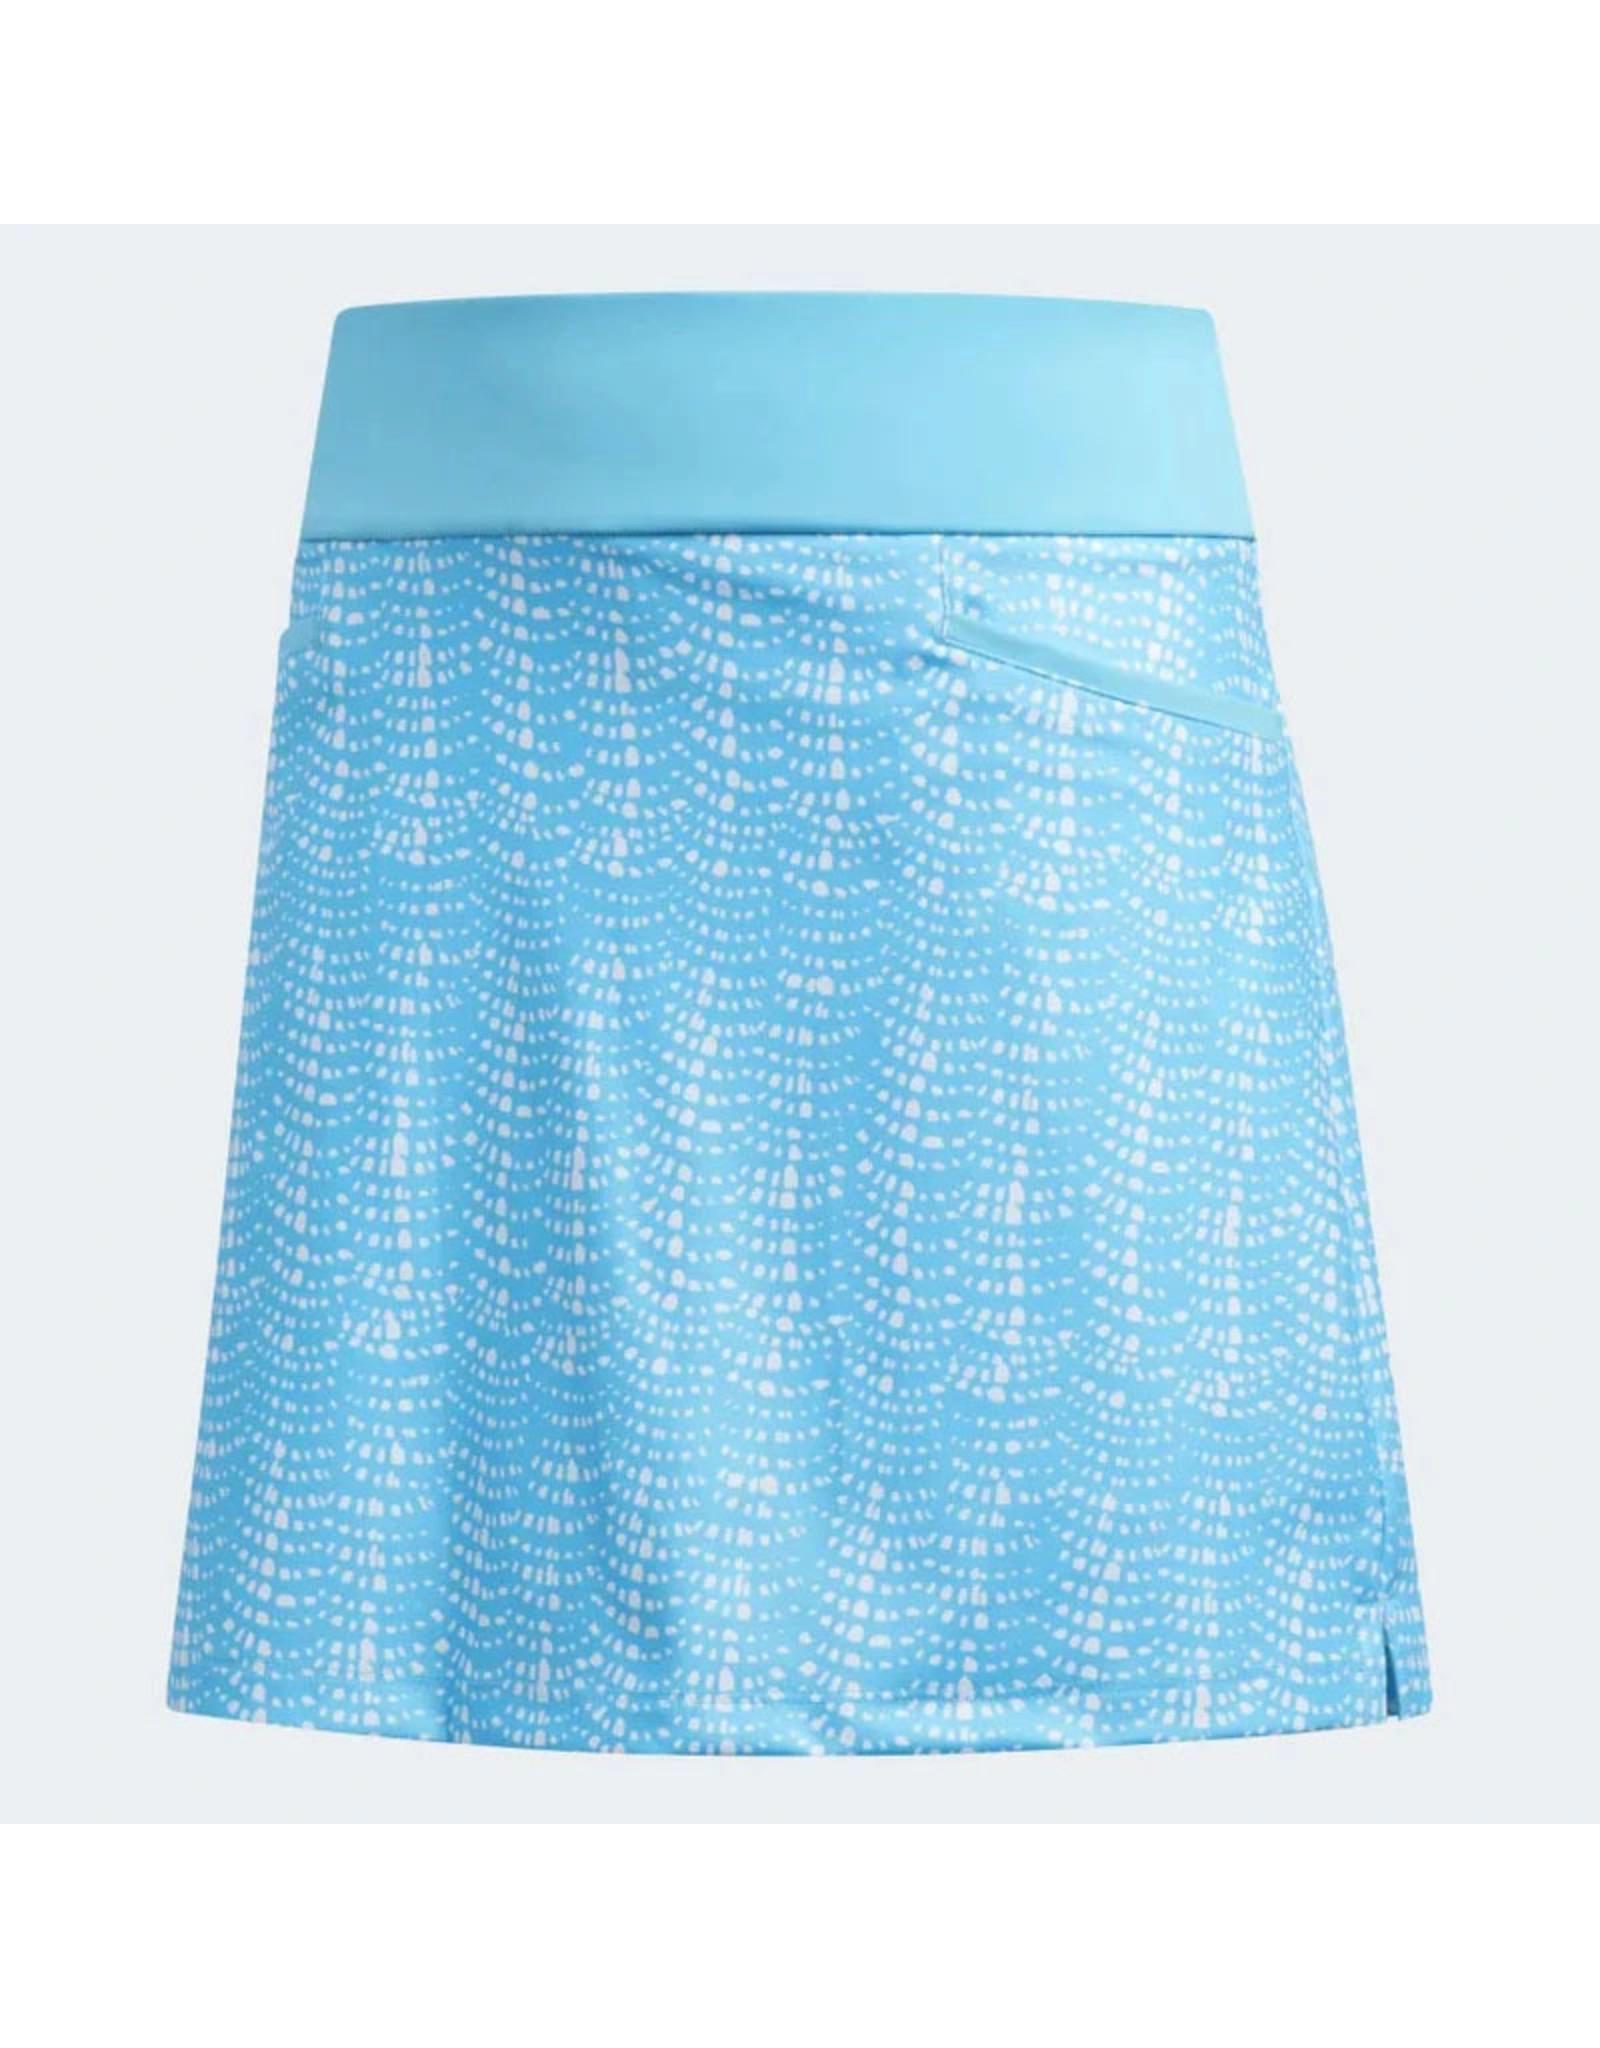 Adidas Adidas Women's Skirt XLL (DQ0490)